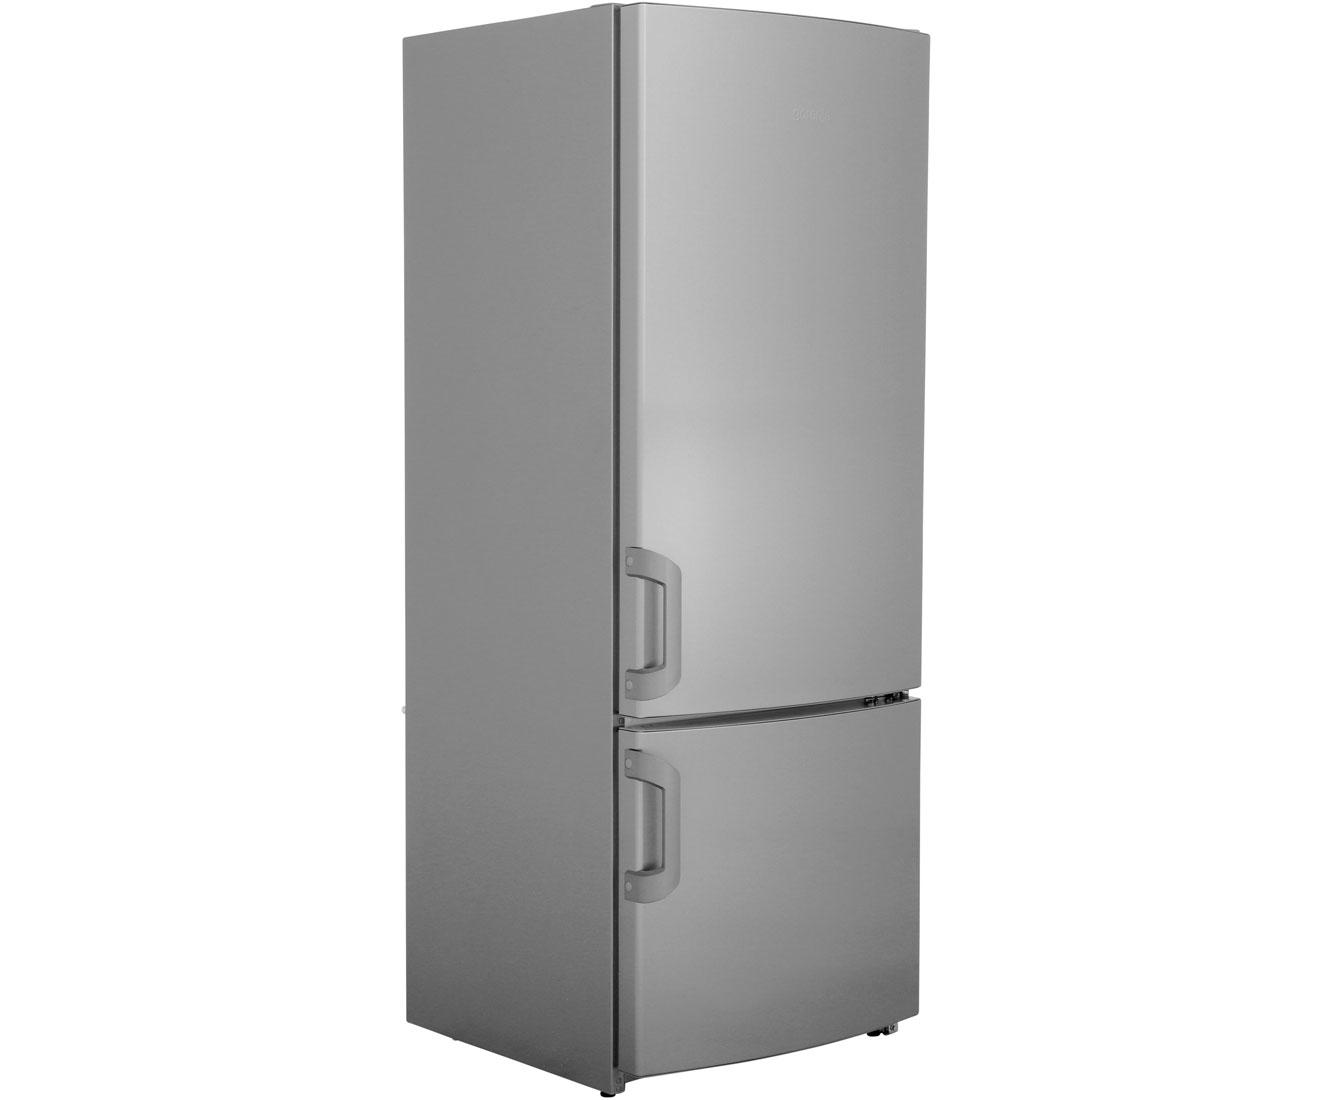 Gorenje Kühlschrank Kombi : Gorenje rk61620x kühl gefrierkombination 60er breite edelstahl a